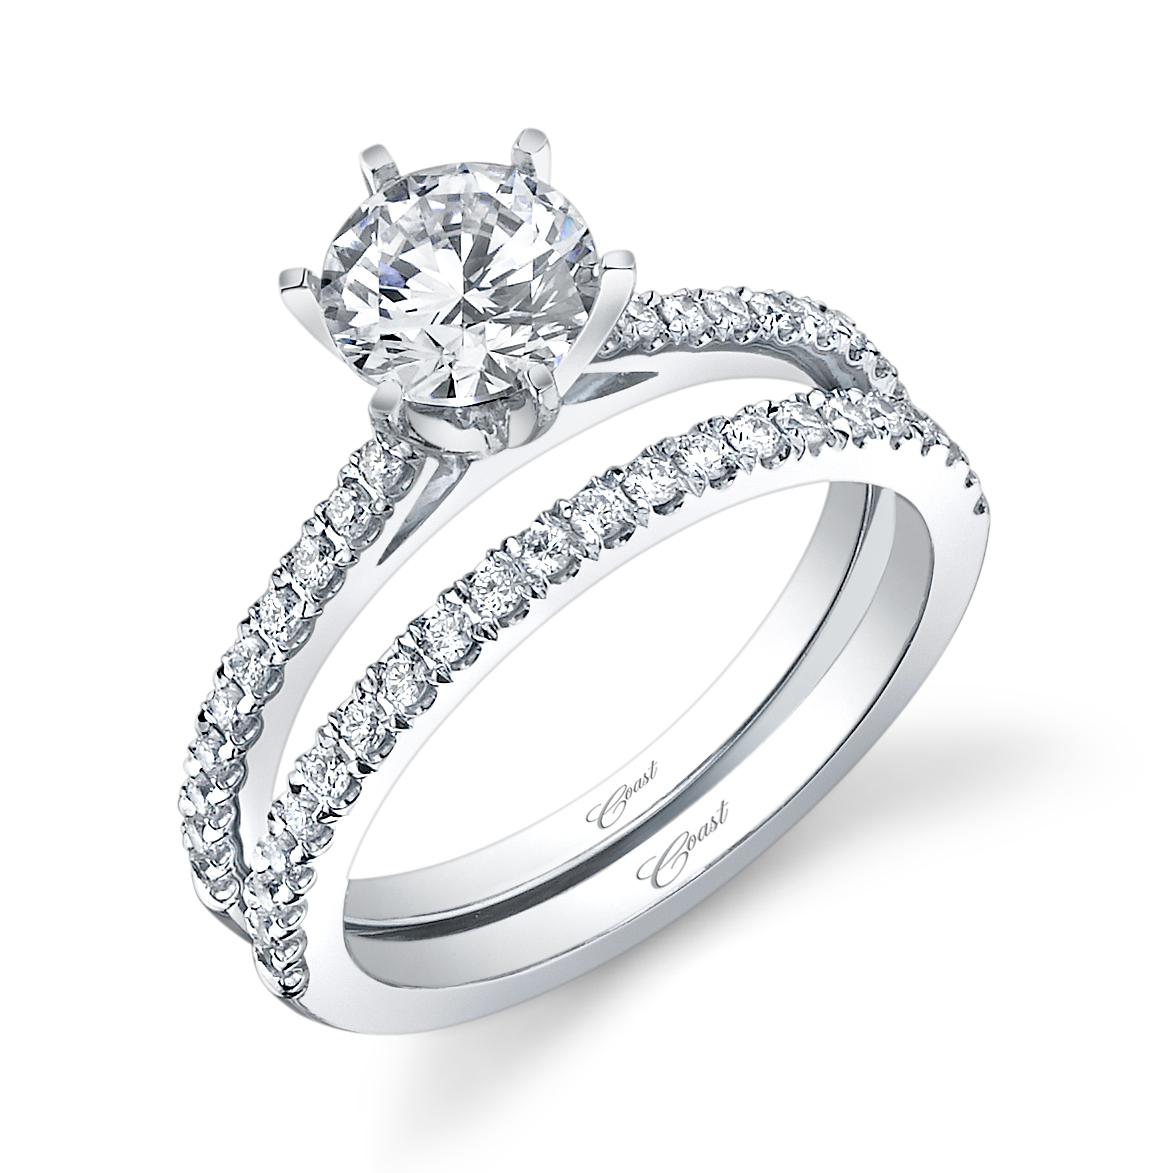 Charisma Engagement Ring - Classic